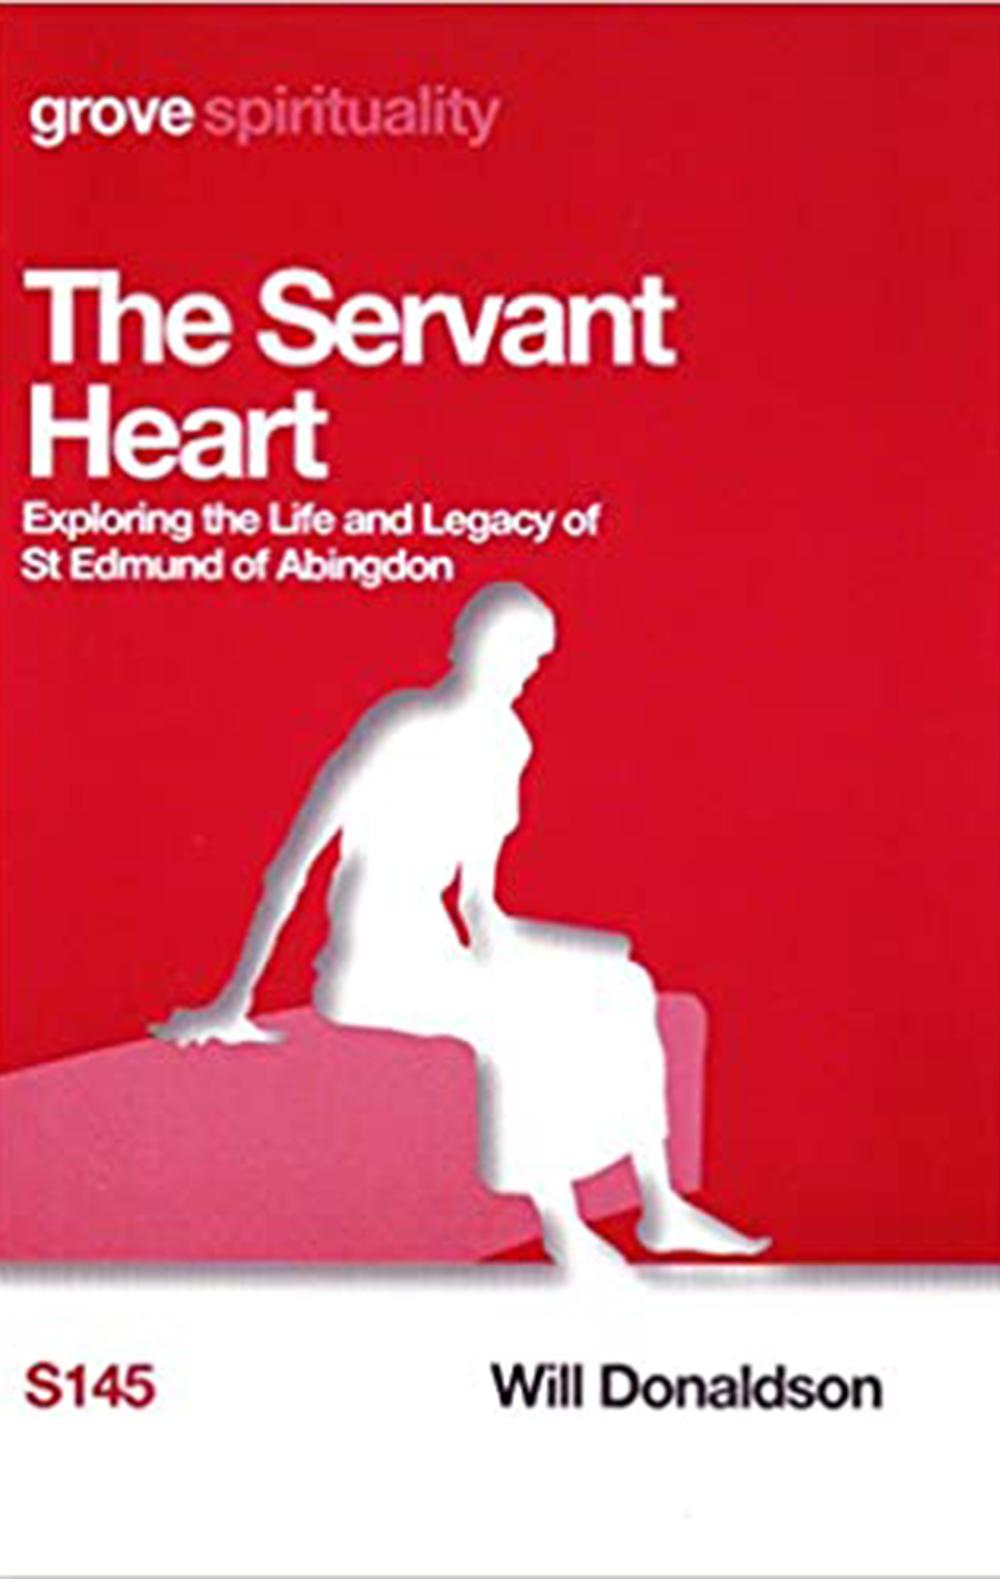 The Servant Heart